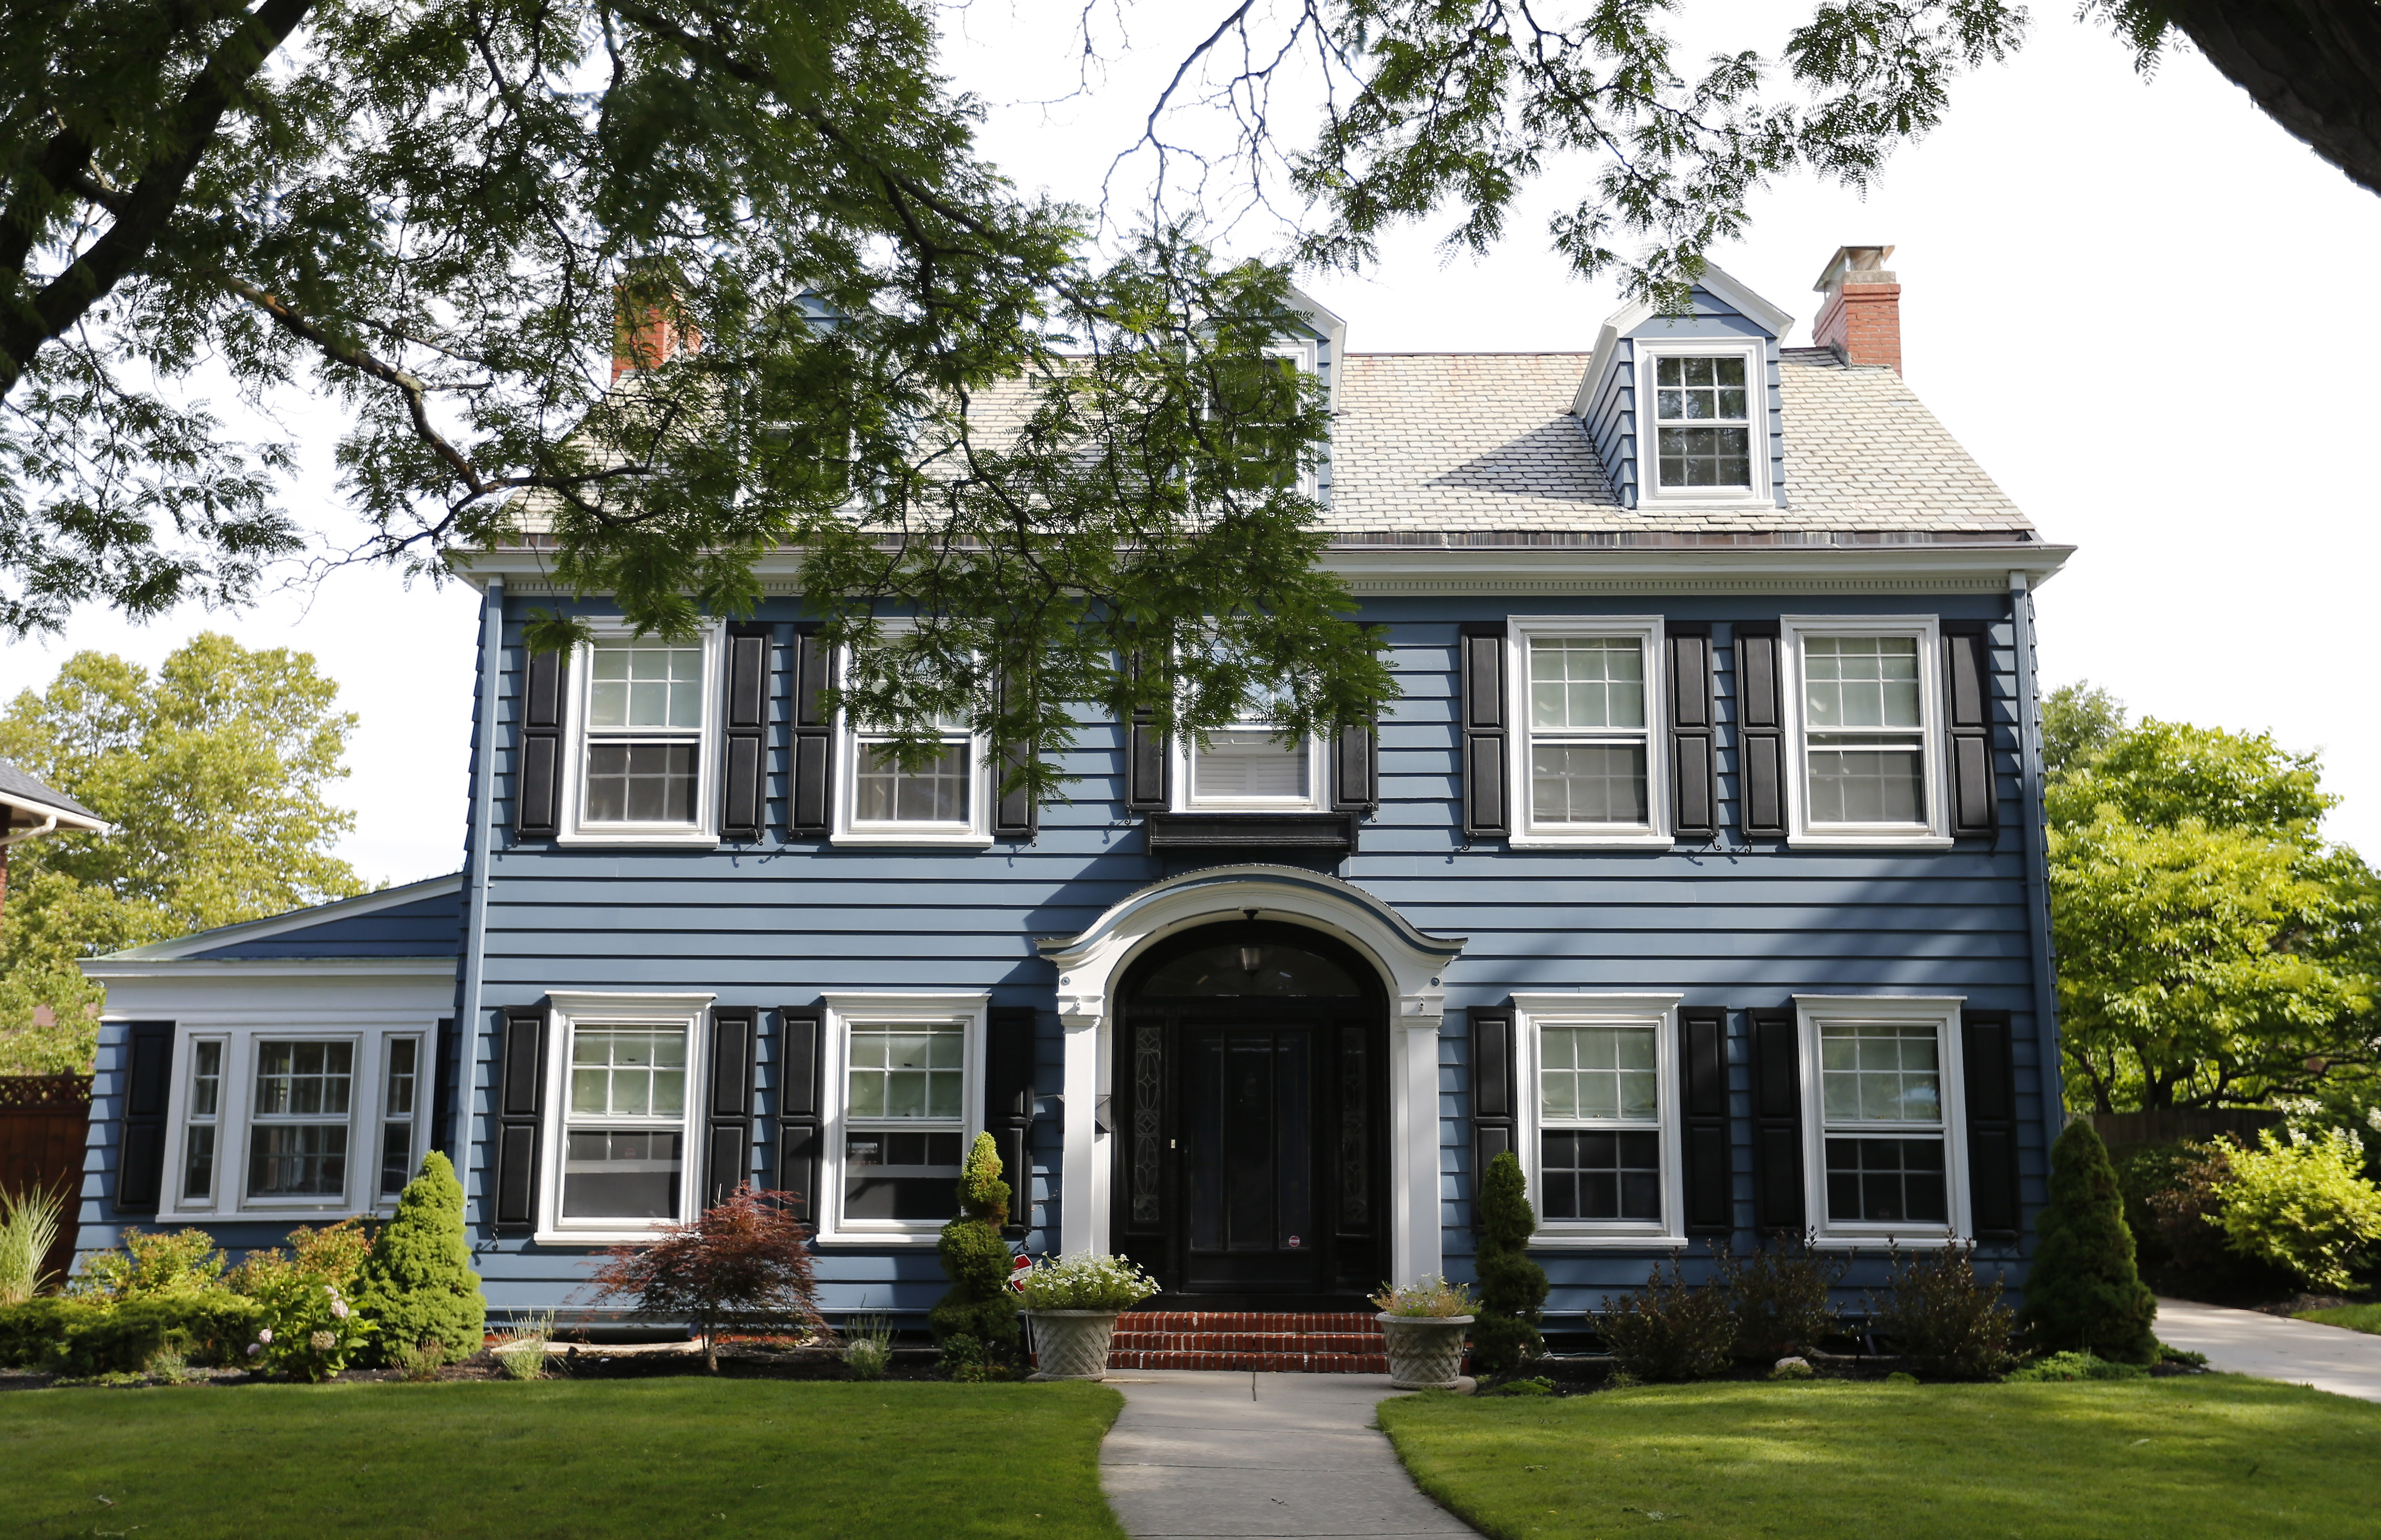 The Central Park neighborhood home of Josephine Zagarella and Torsten Behrens in Buffalo Wednesday, August 17, 2016.       (Mark Mulville/Buffalo News)